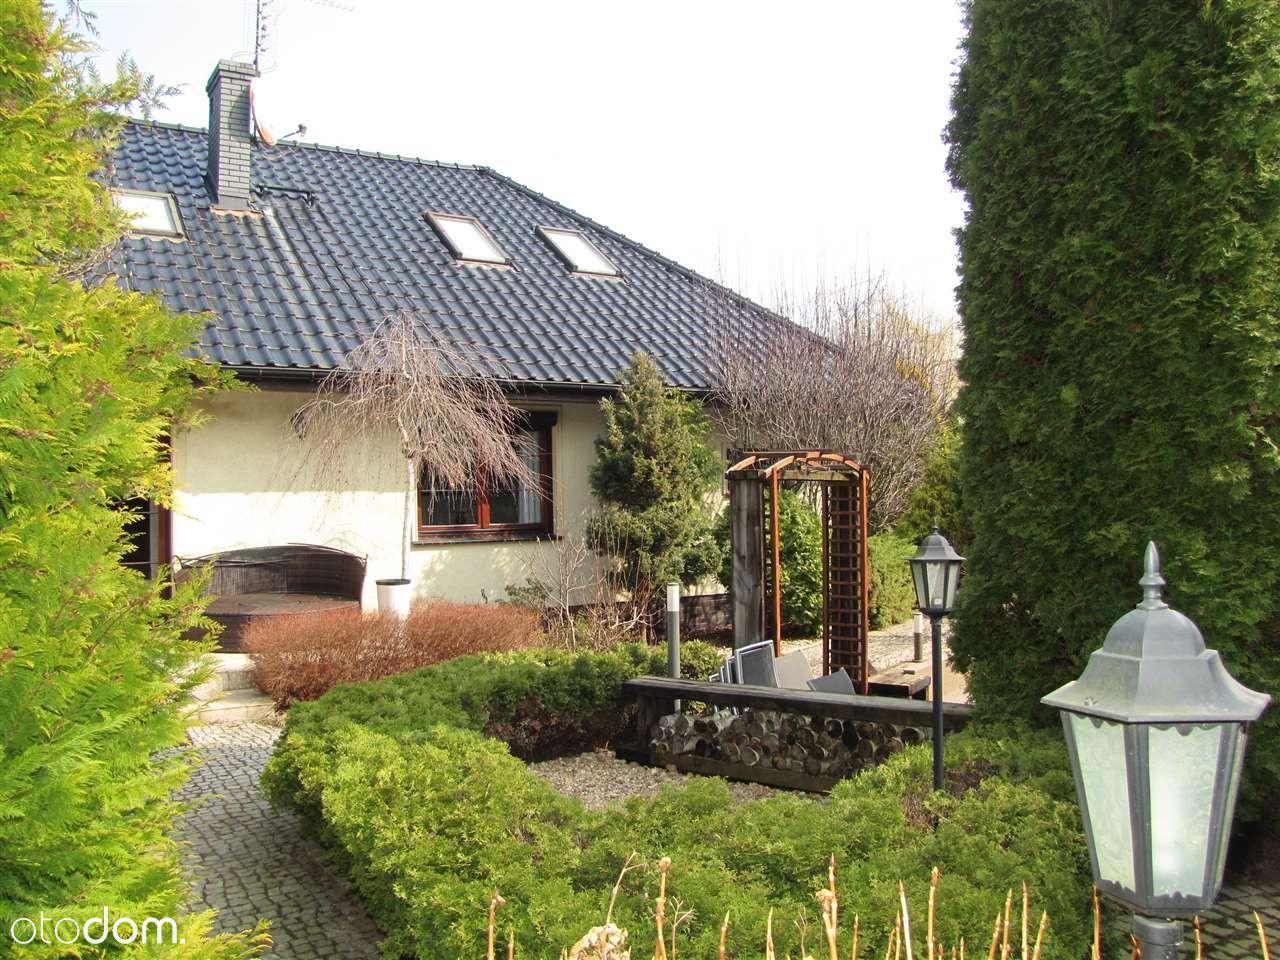 Smolec zadbany piękny ogród 